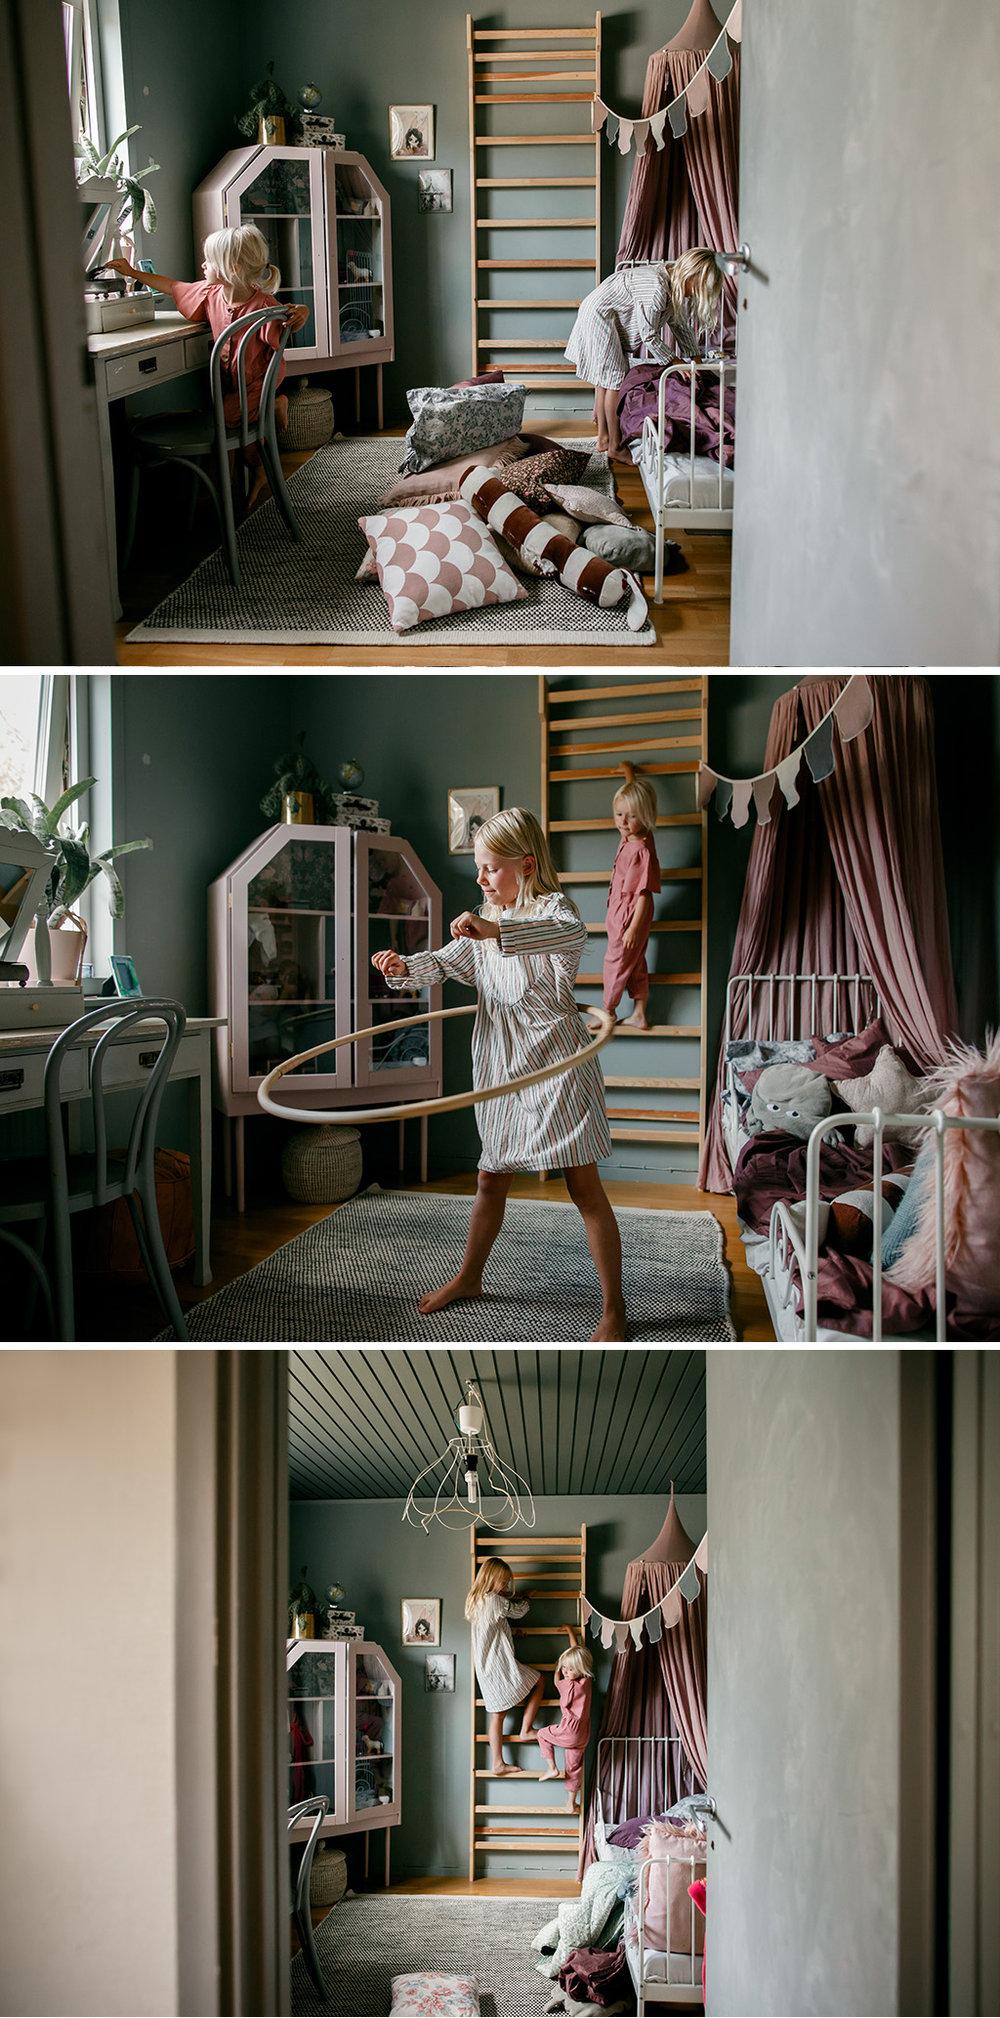 Lifestyle_familjefotografering_Stockholm_hemma-hos-fotografering_lifestyle-inhome-session_8.jpg